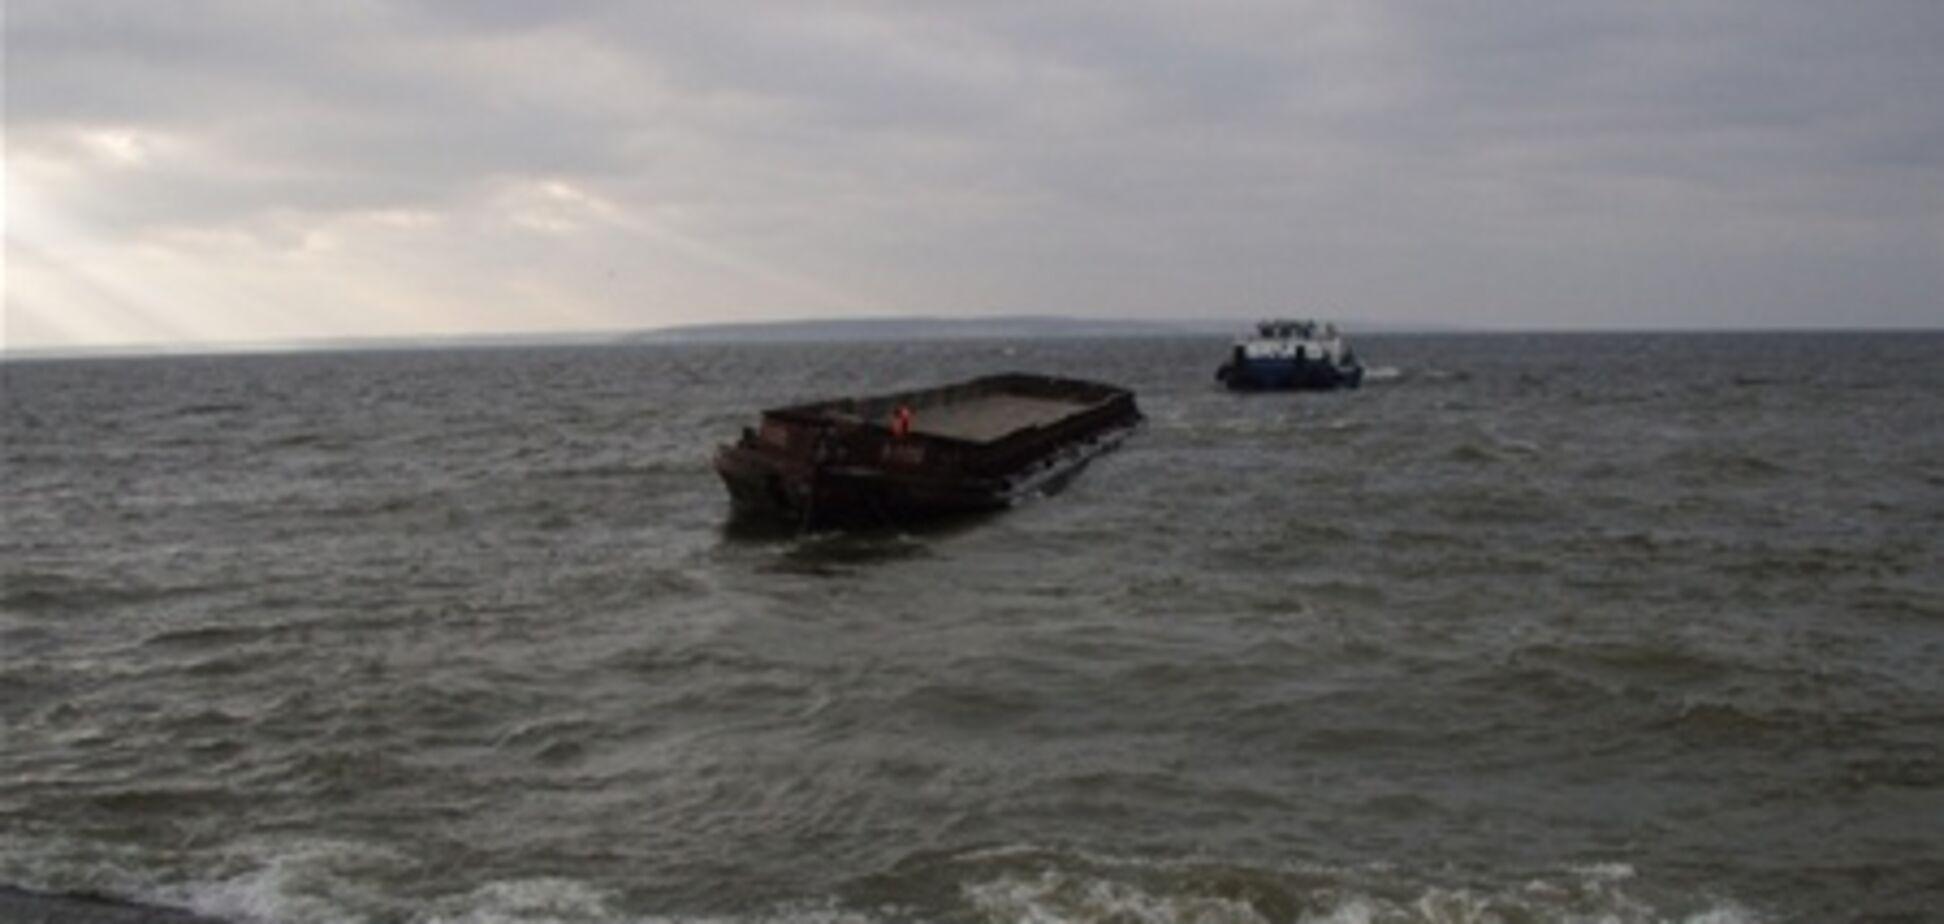 Экипаж буксира 'Нибулон-1' спас моряка и две баржи в Кременчугском водохранилище